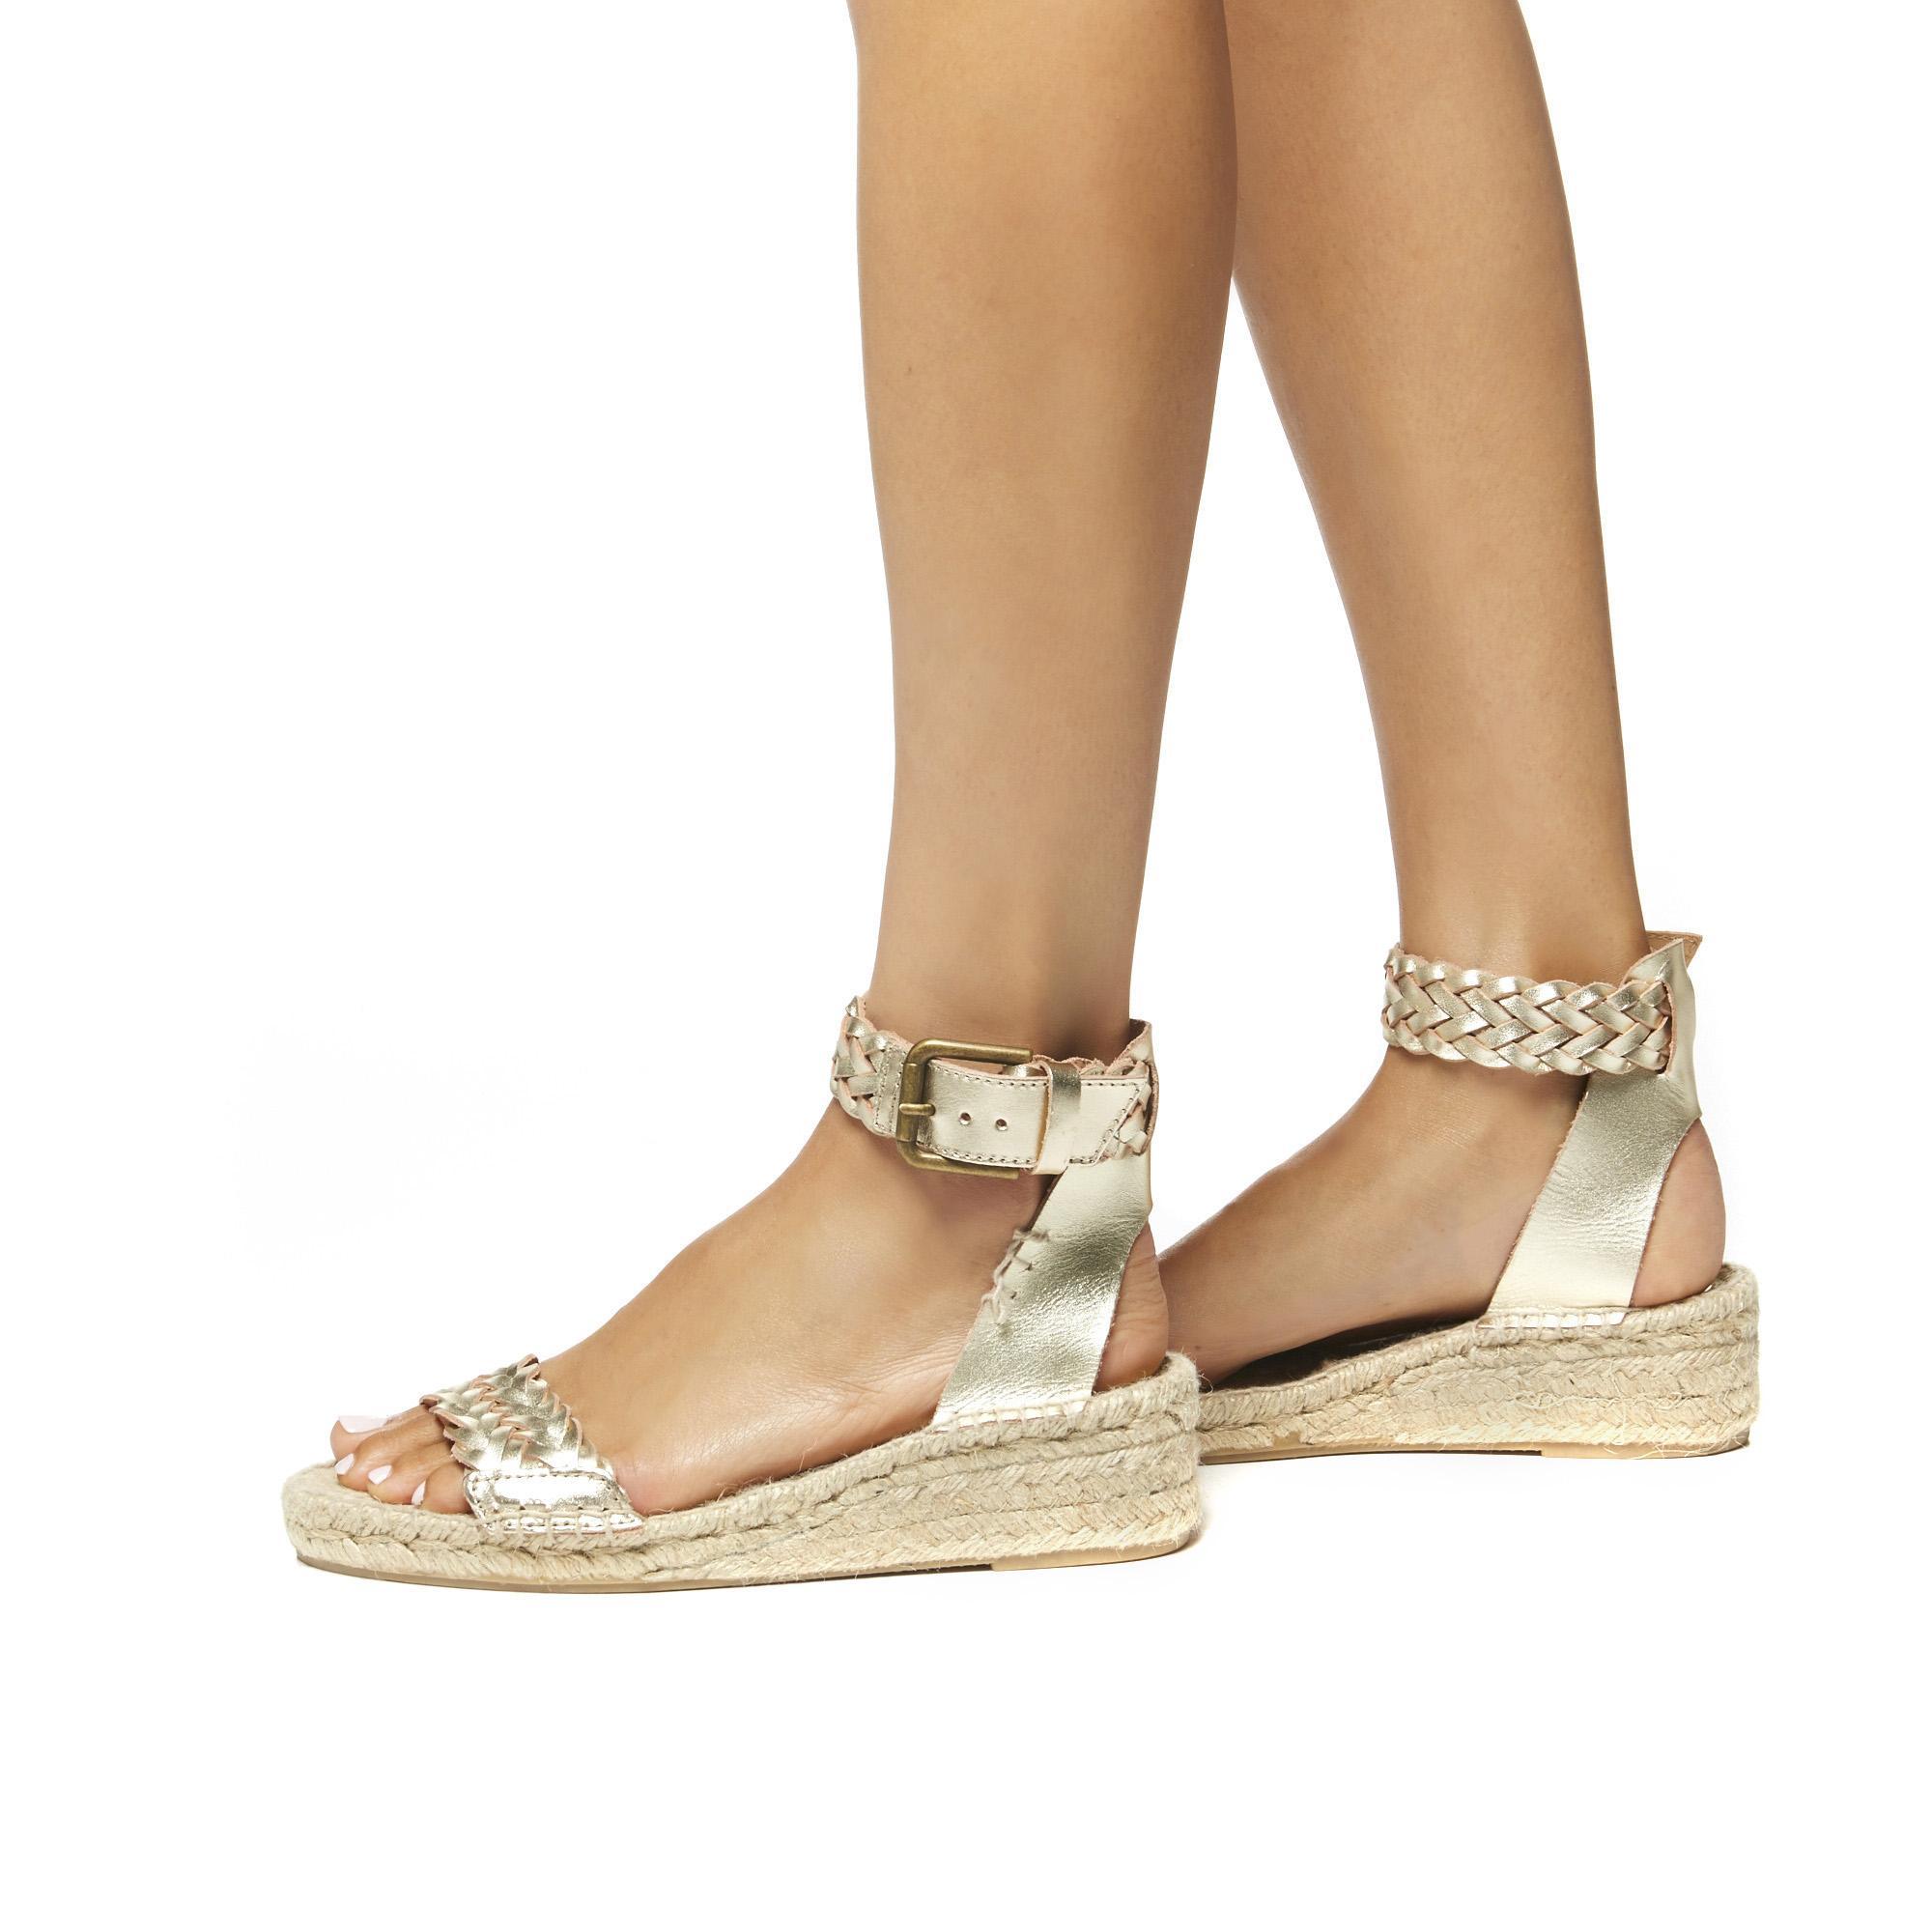 ae5ec0654df Soludos Metallic Woven Leather Demi Wedge Sandal in Metallic - Lyst